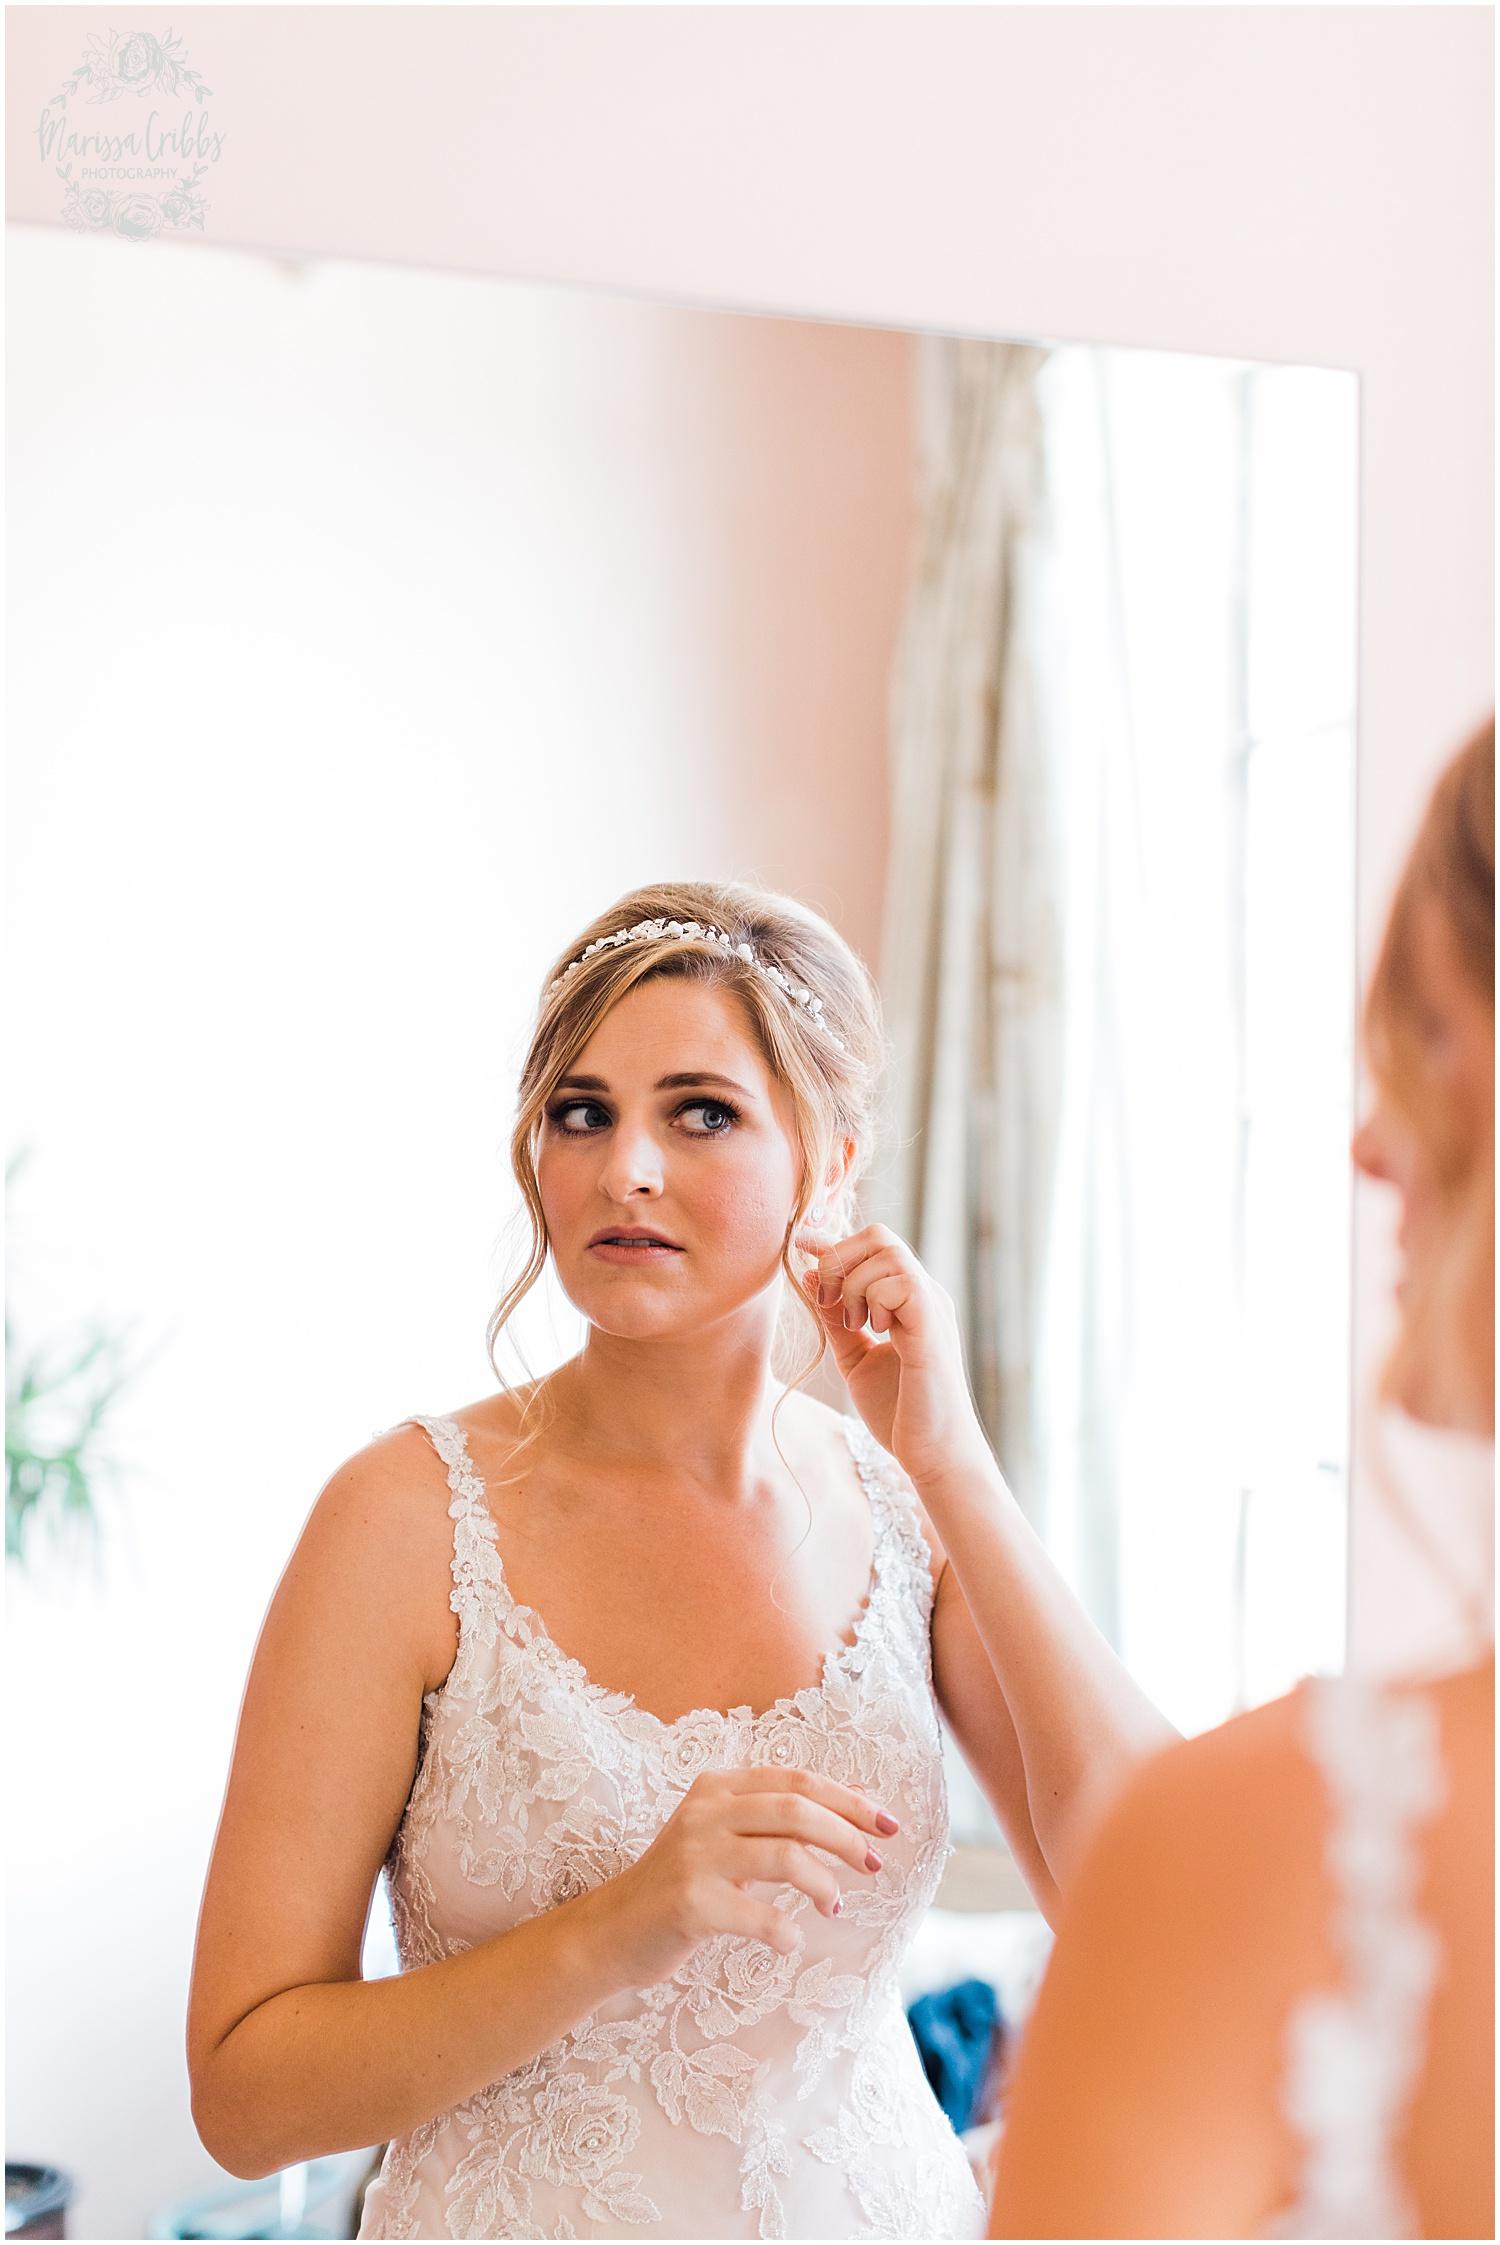 BAUER WEDDING   KELSEA & JUSTIN   MARISSA CRIBBS PHOTOGRAPHY_6496.jpg